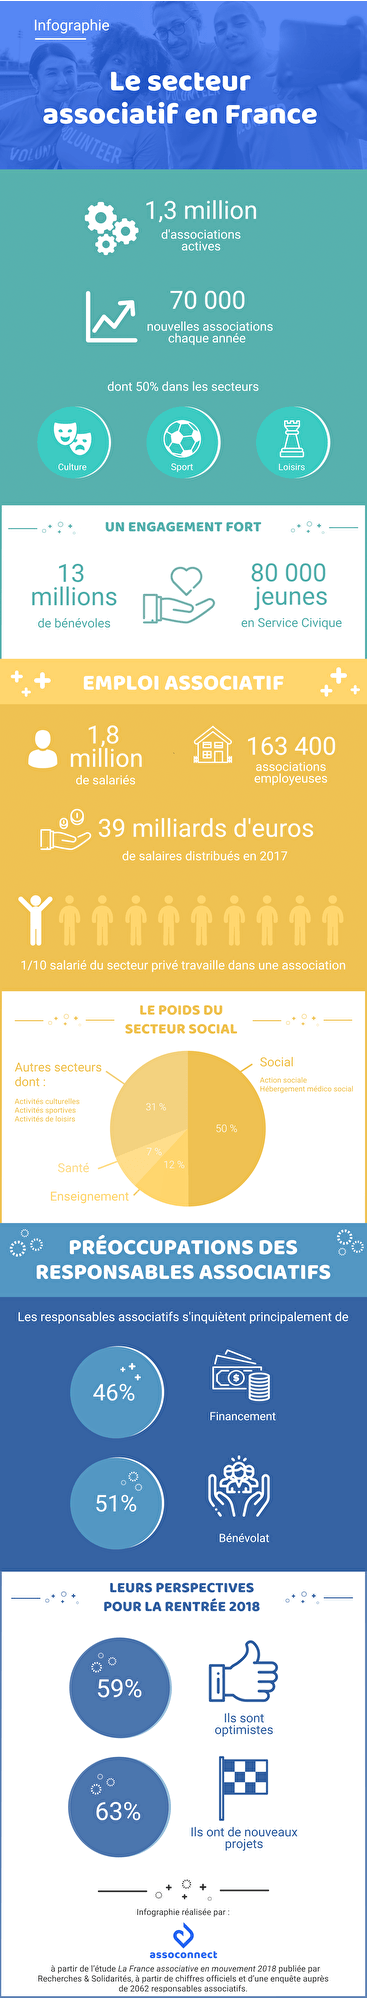 assoconnect monde associatif infographie 2018